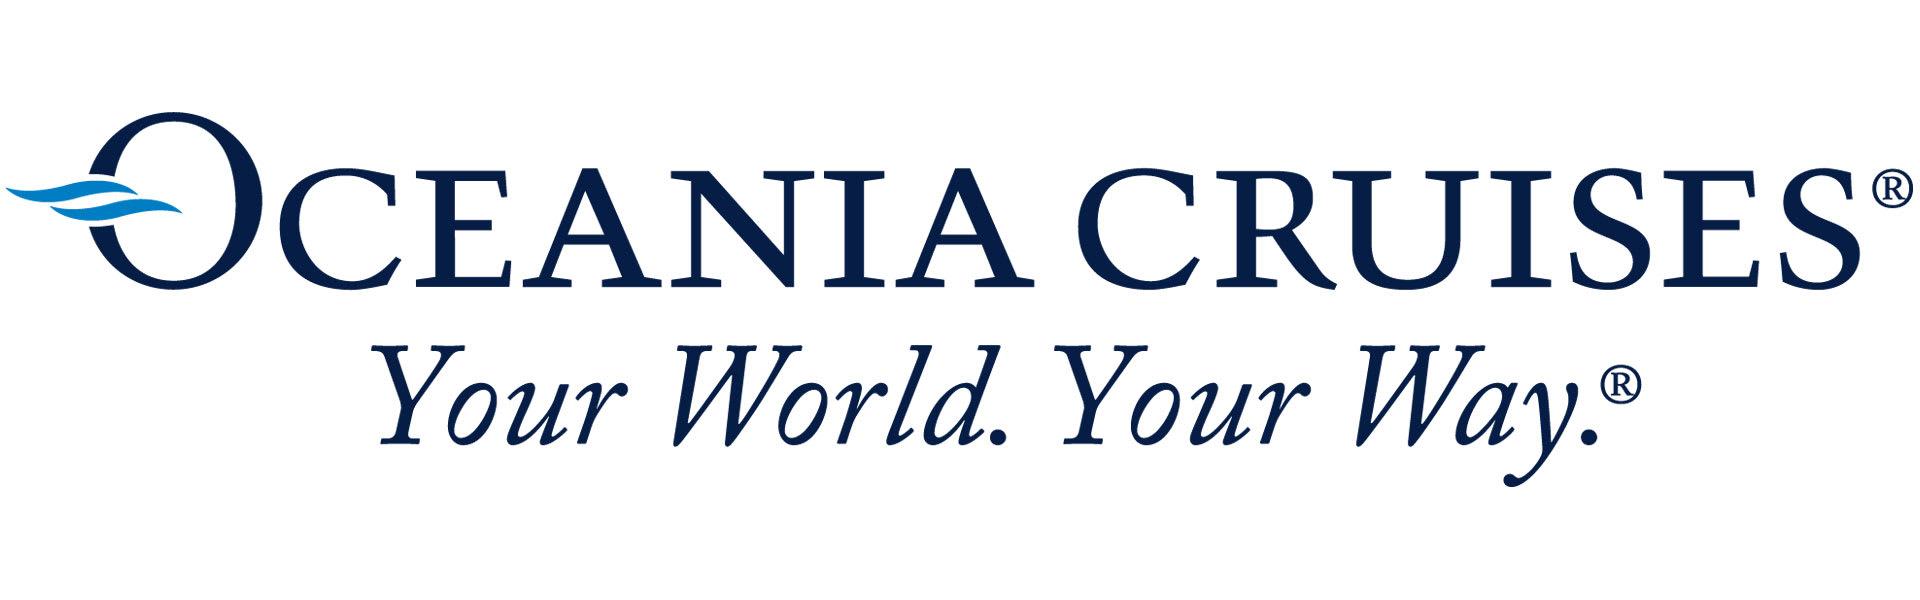 Oceania-Cruises-Logo